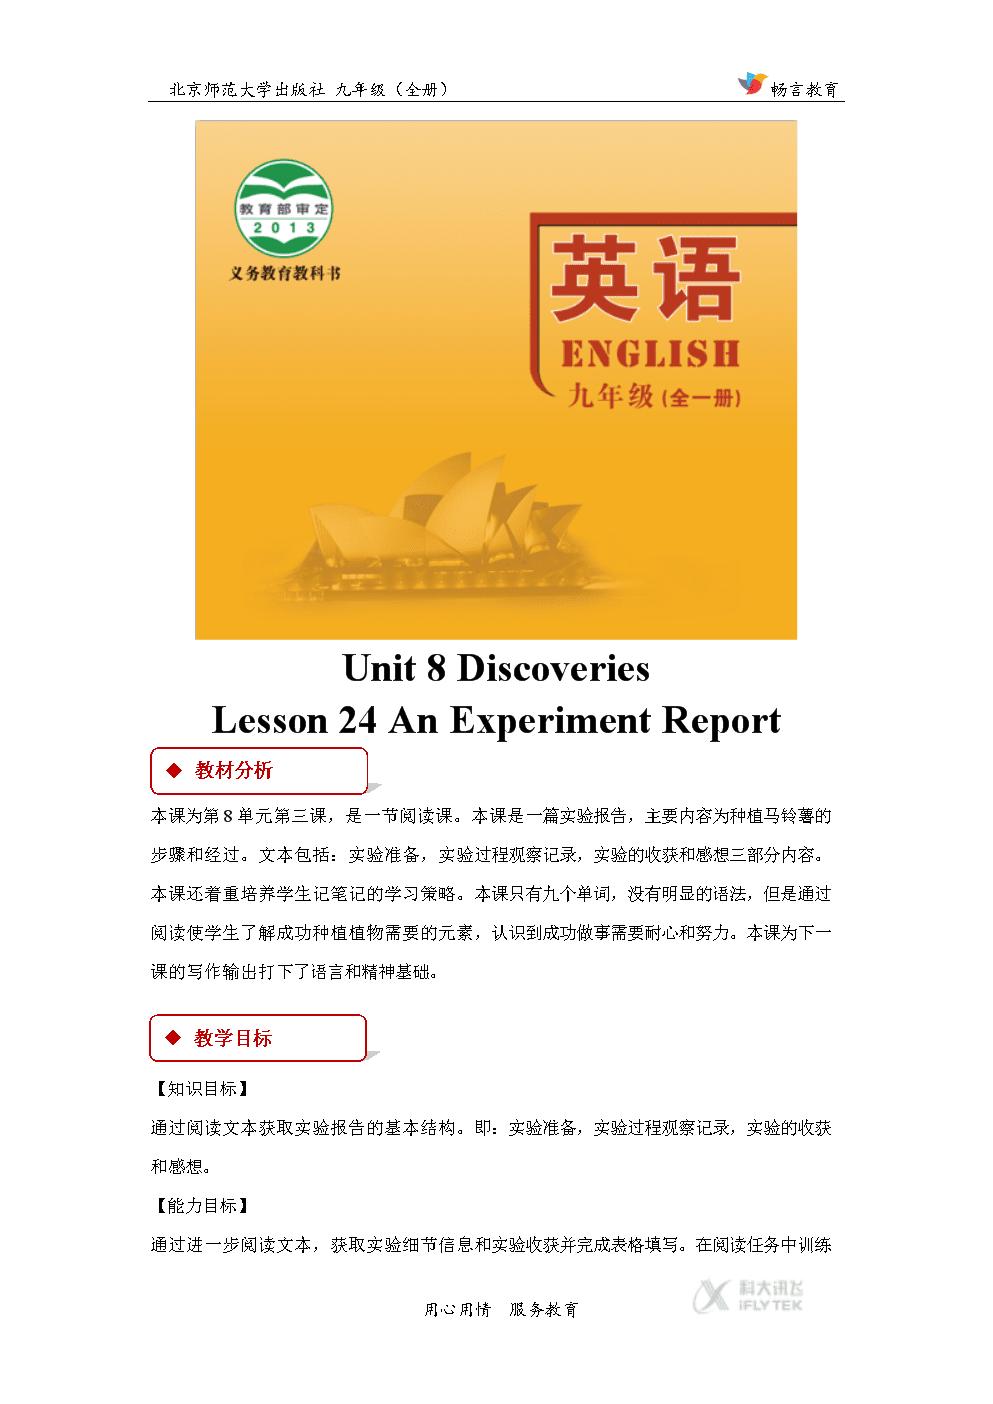 【教学设计】Unit 8 Lesson 24(北师大).docx